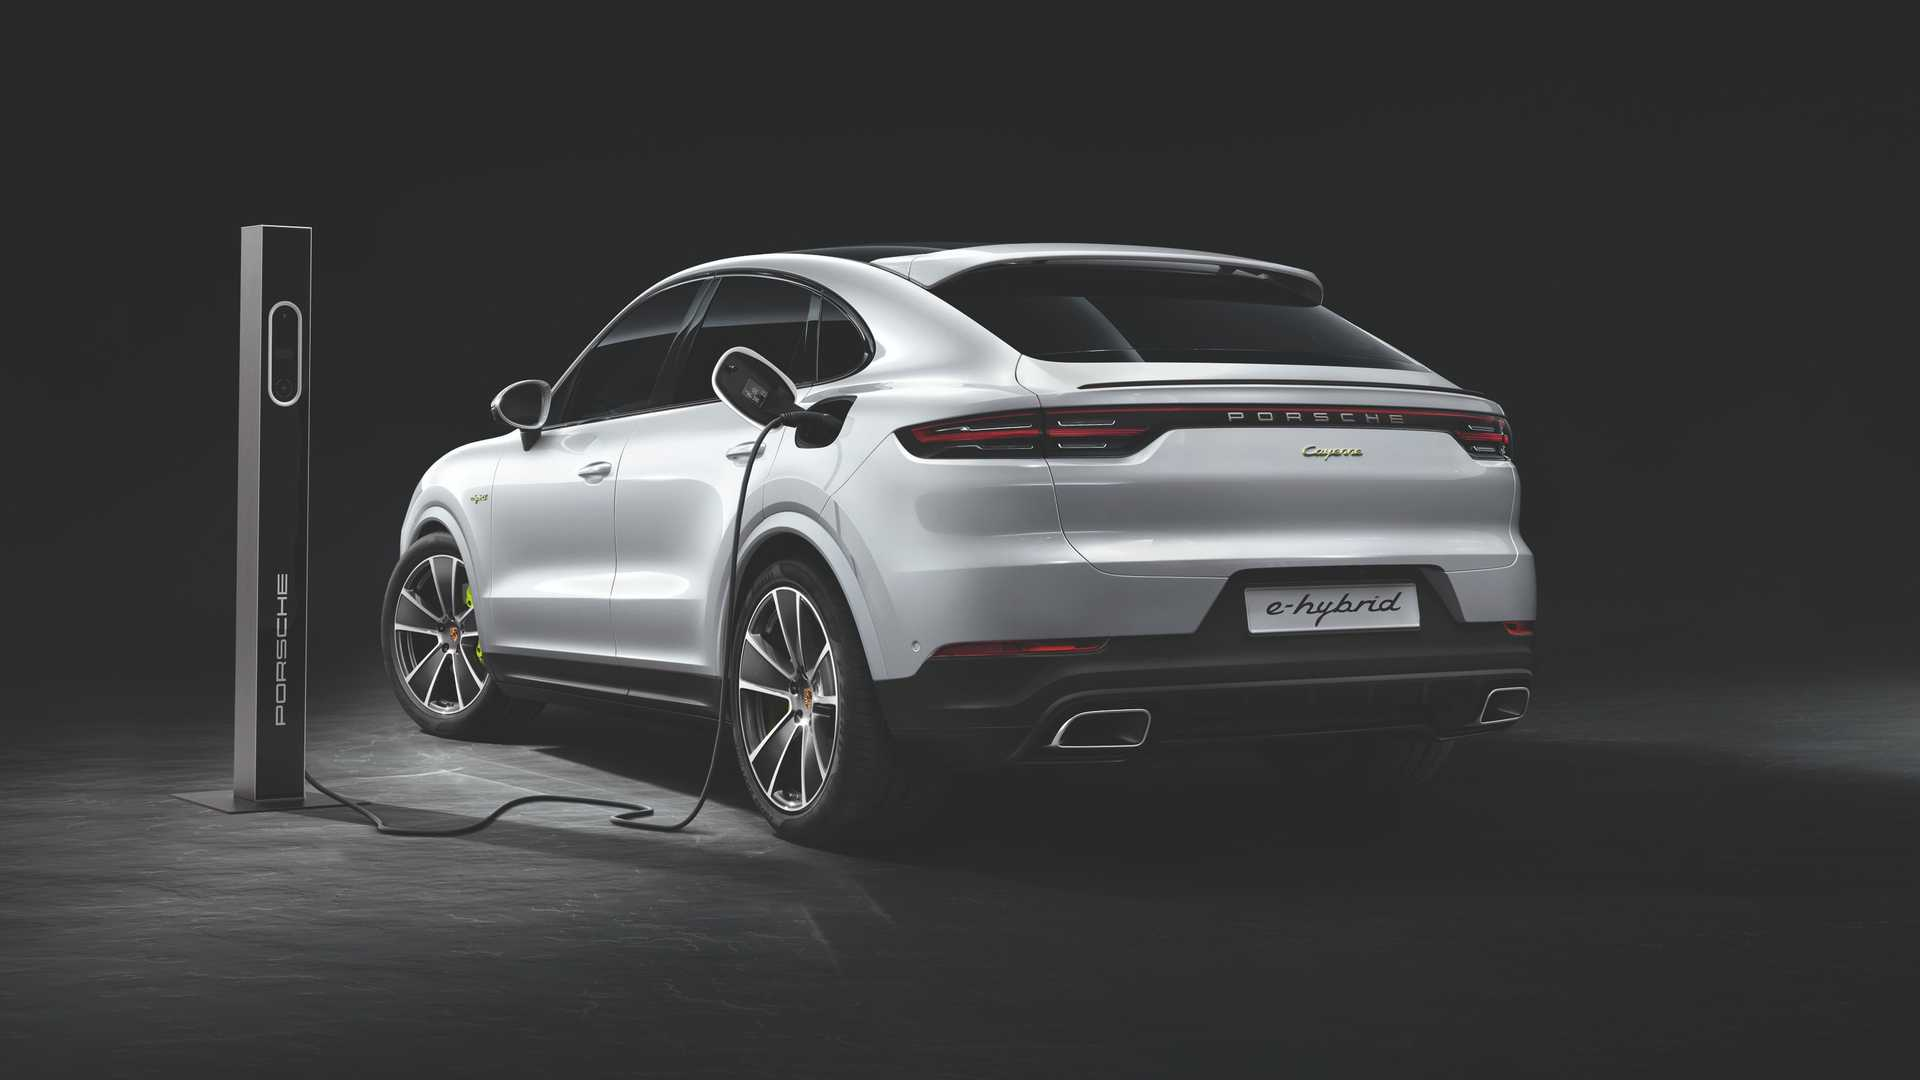 2020-porsche-cayenne-turbo-s-e-hybrid-coupe-turbo-s-e-hybrid-and-coupe-e-hybrid-7